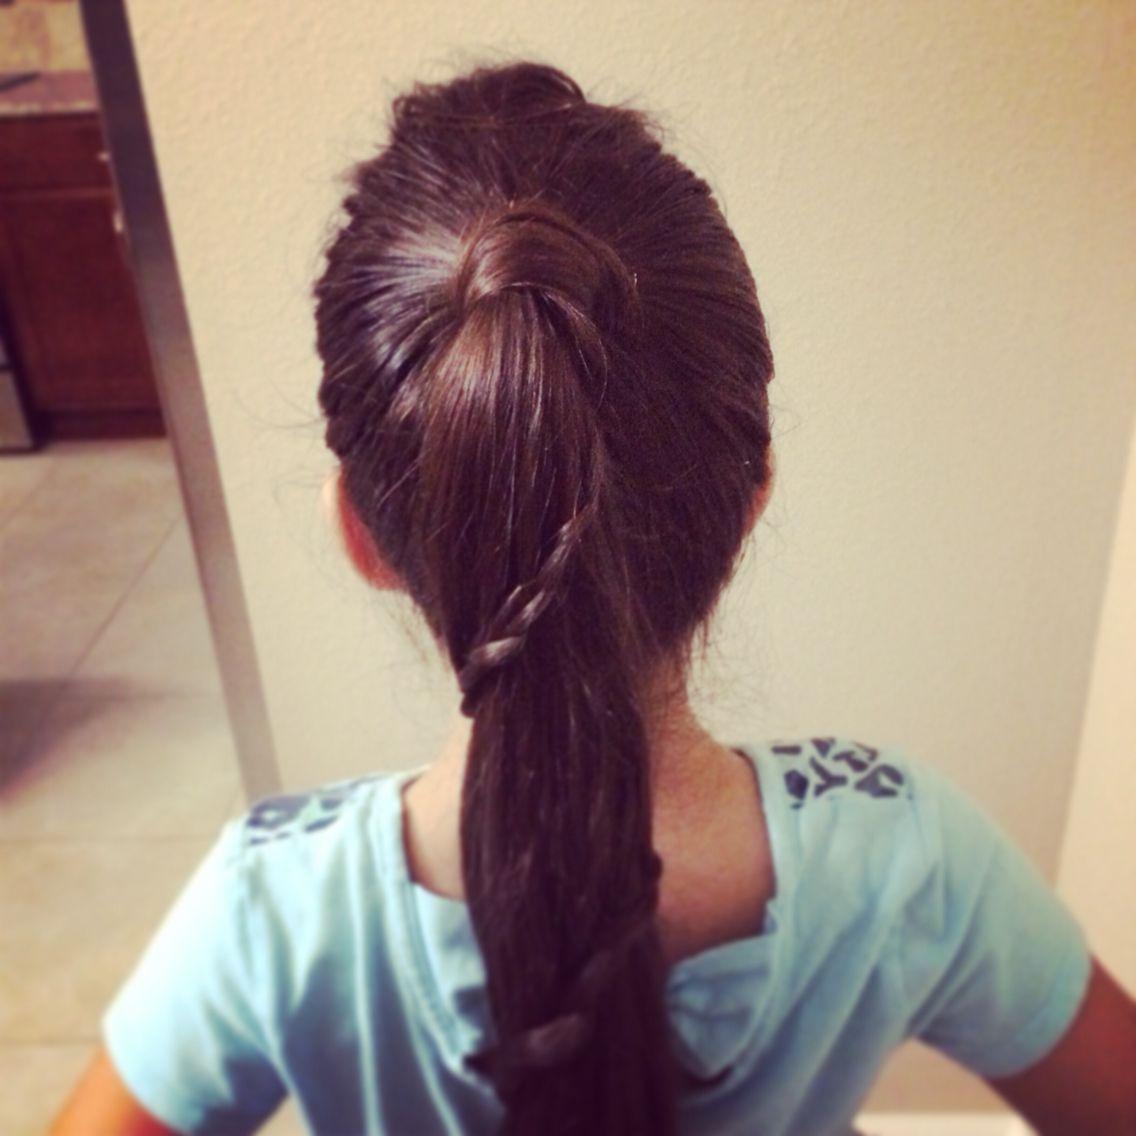 Simple ponytail / hair style